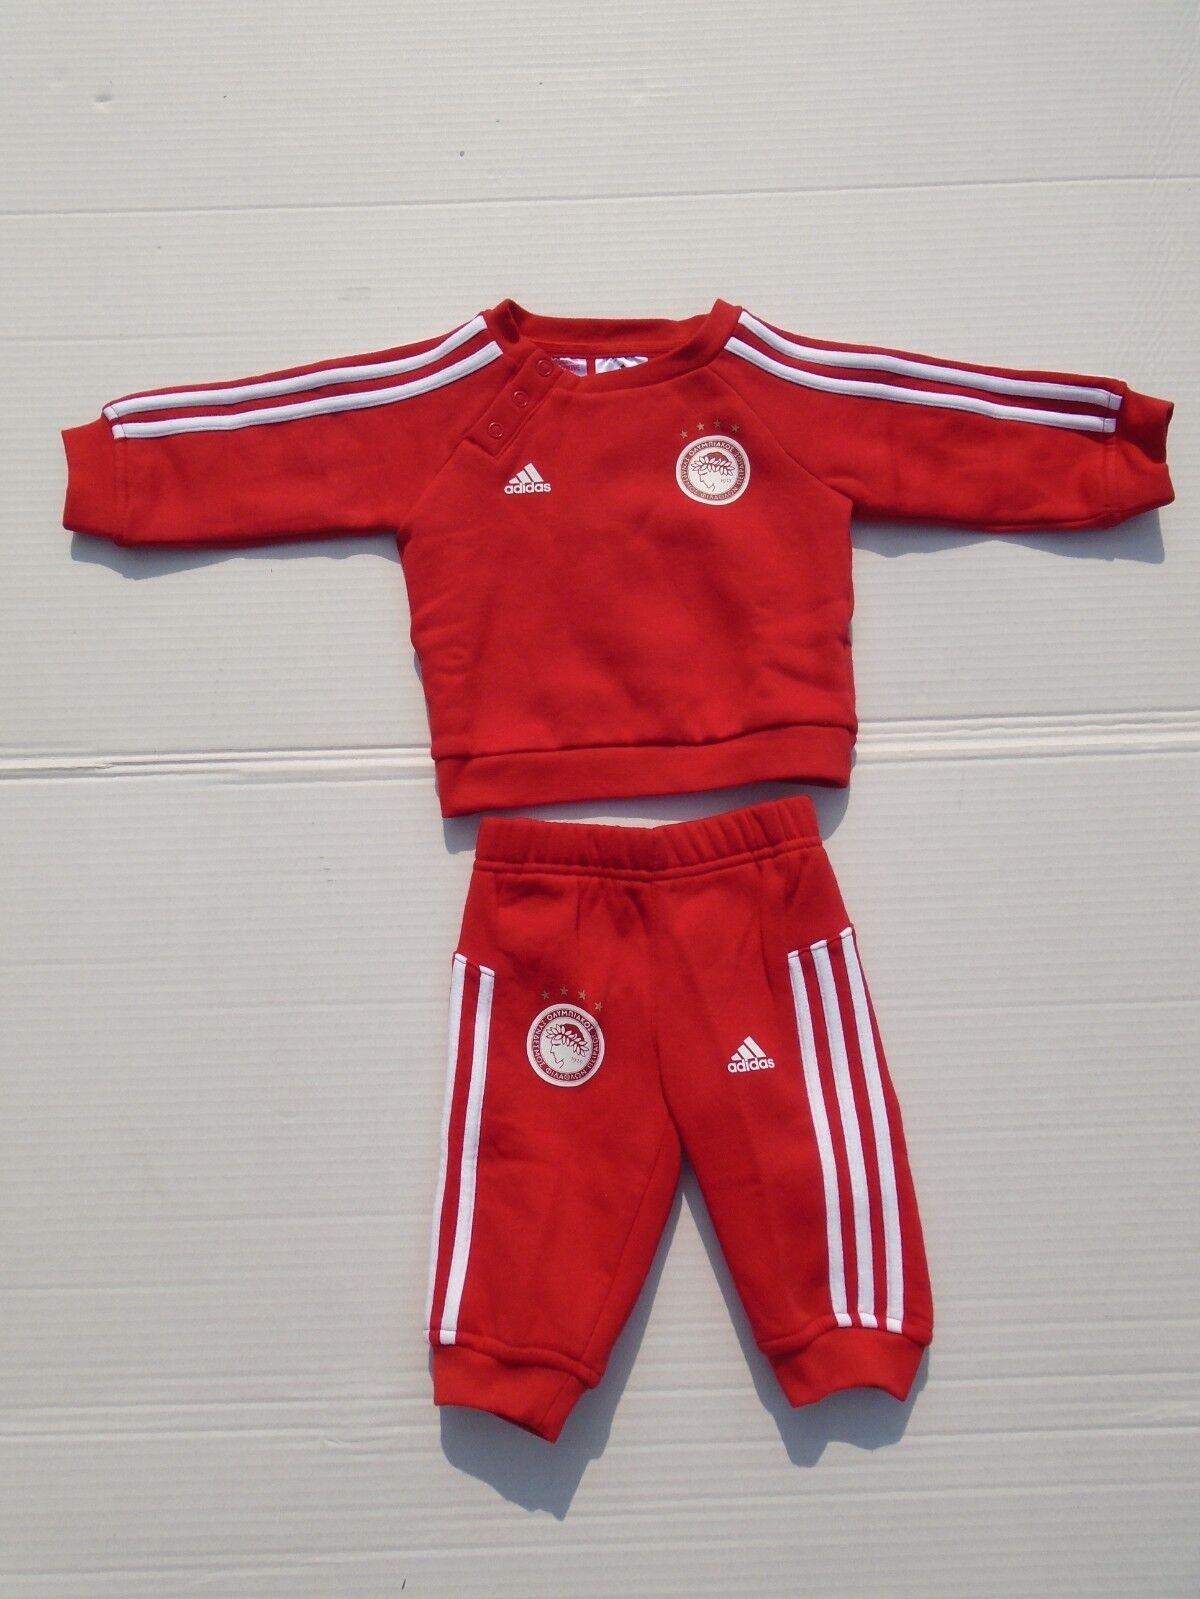 da285e2a43a673 Adidas Baby-Jogger Trainingsanzug Jacke-Hose-Set Kinder-Jogginganzug 62- 104